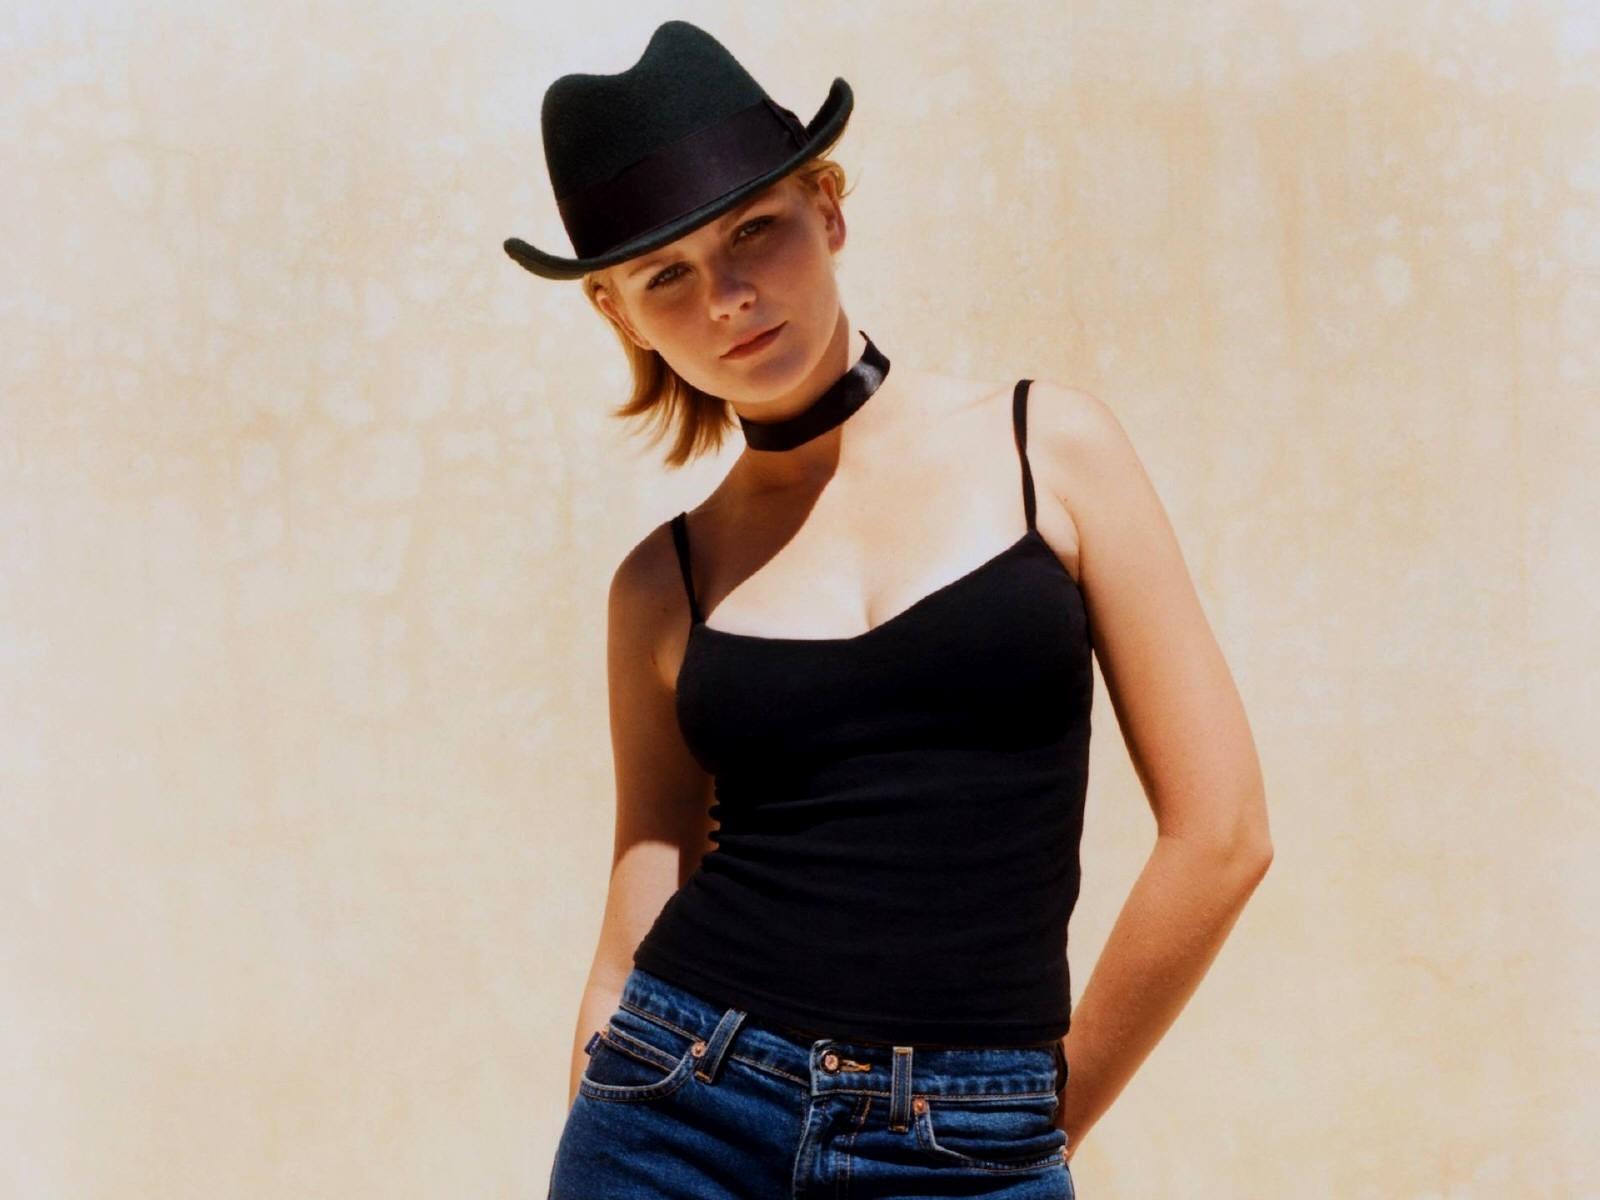 Wallpaper di Kirsten Dunst, sexy cowgirl